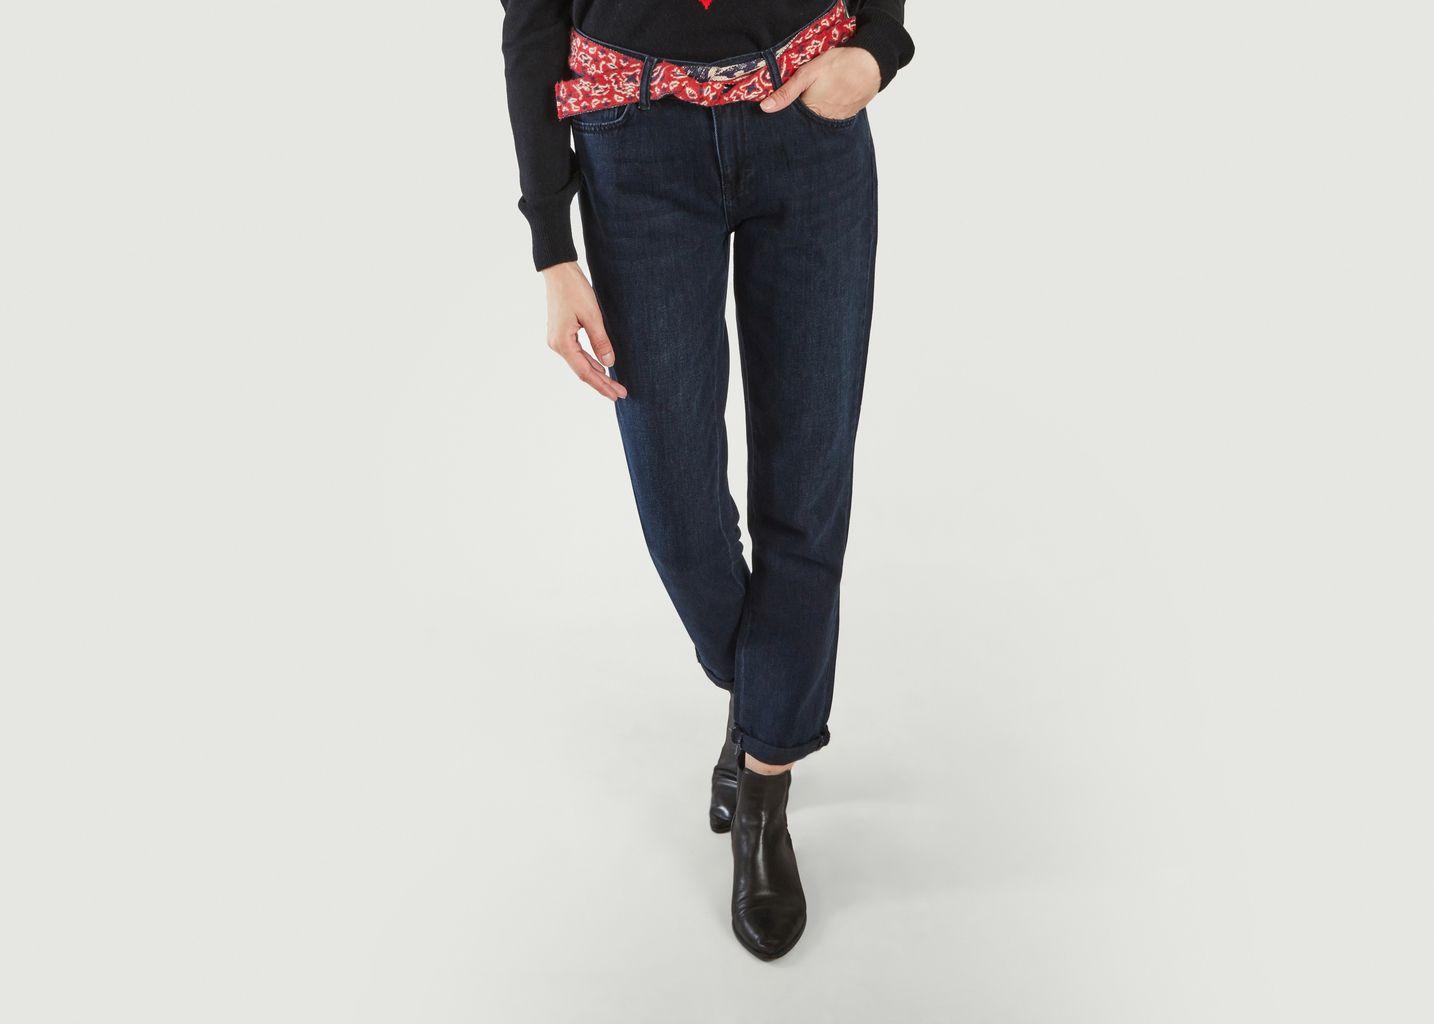 Jeans Tara - Five